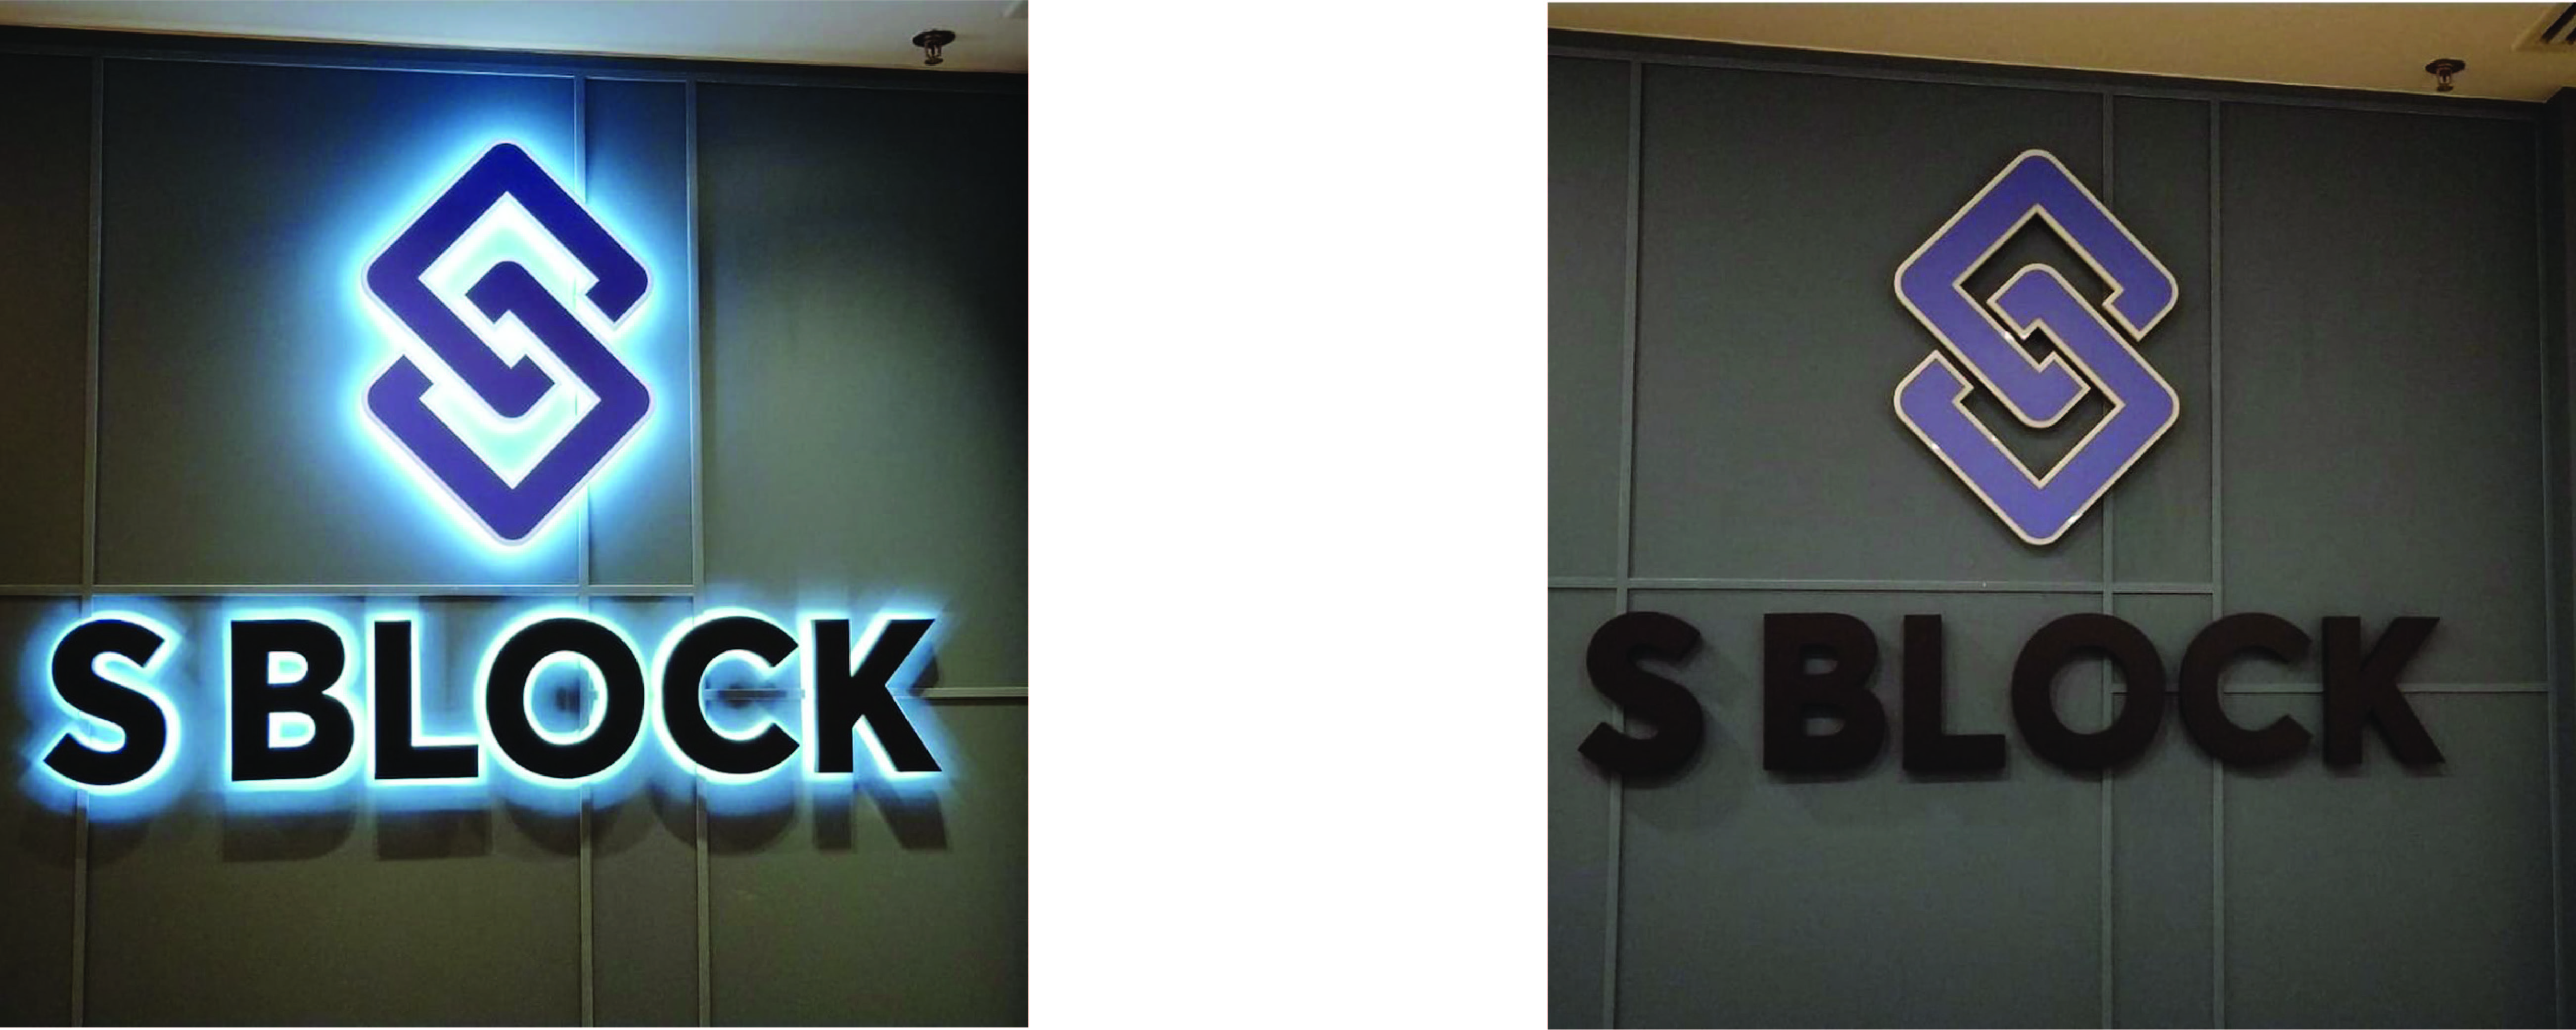 SBlock-01